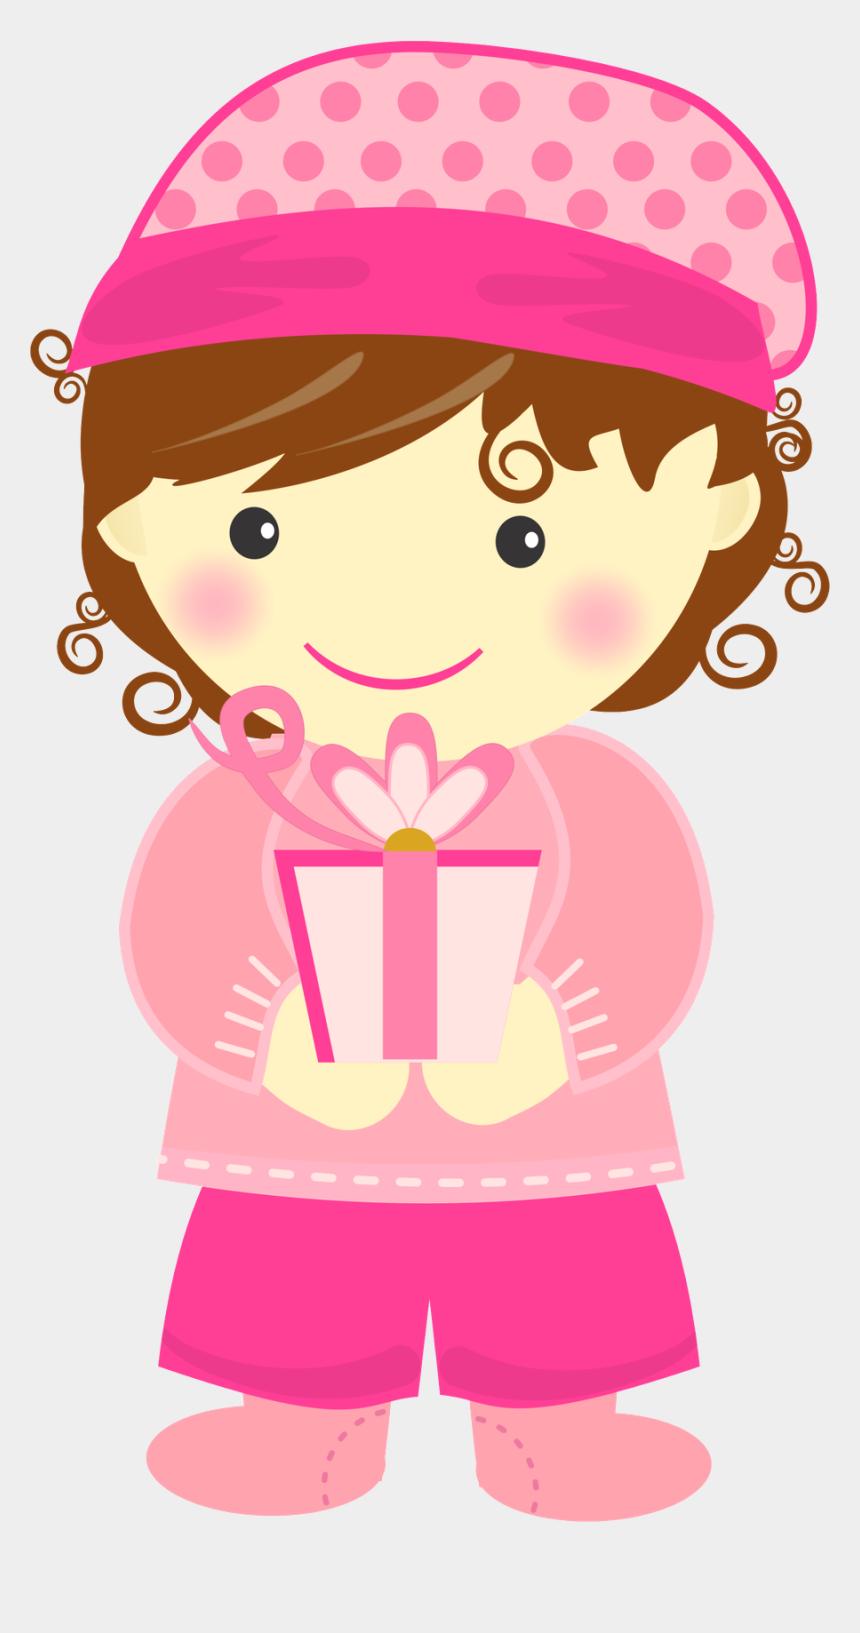 nanny clipart, Cartoons - Disney Clipart, Cute Clipart, Baby Clip Art, Baby Memories, - Imagenes De Niñ0s Caricaturas En Pijamada